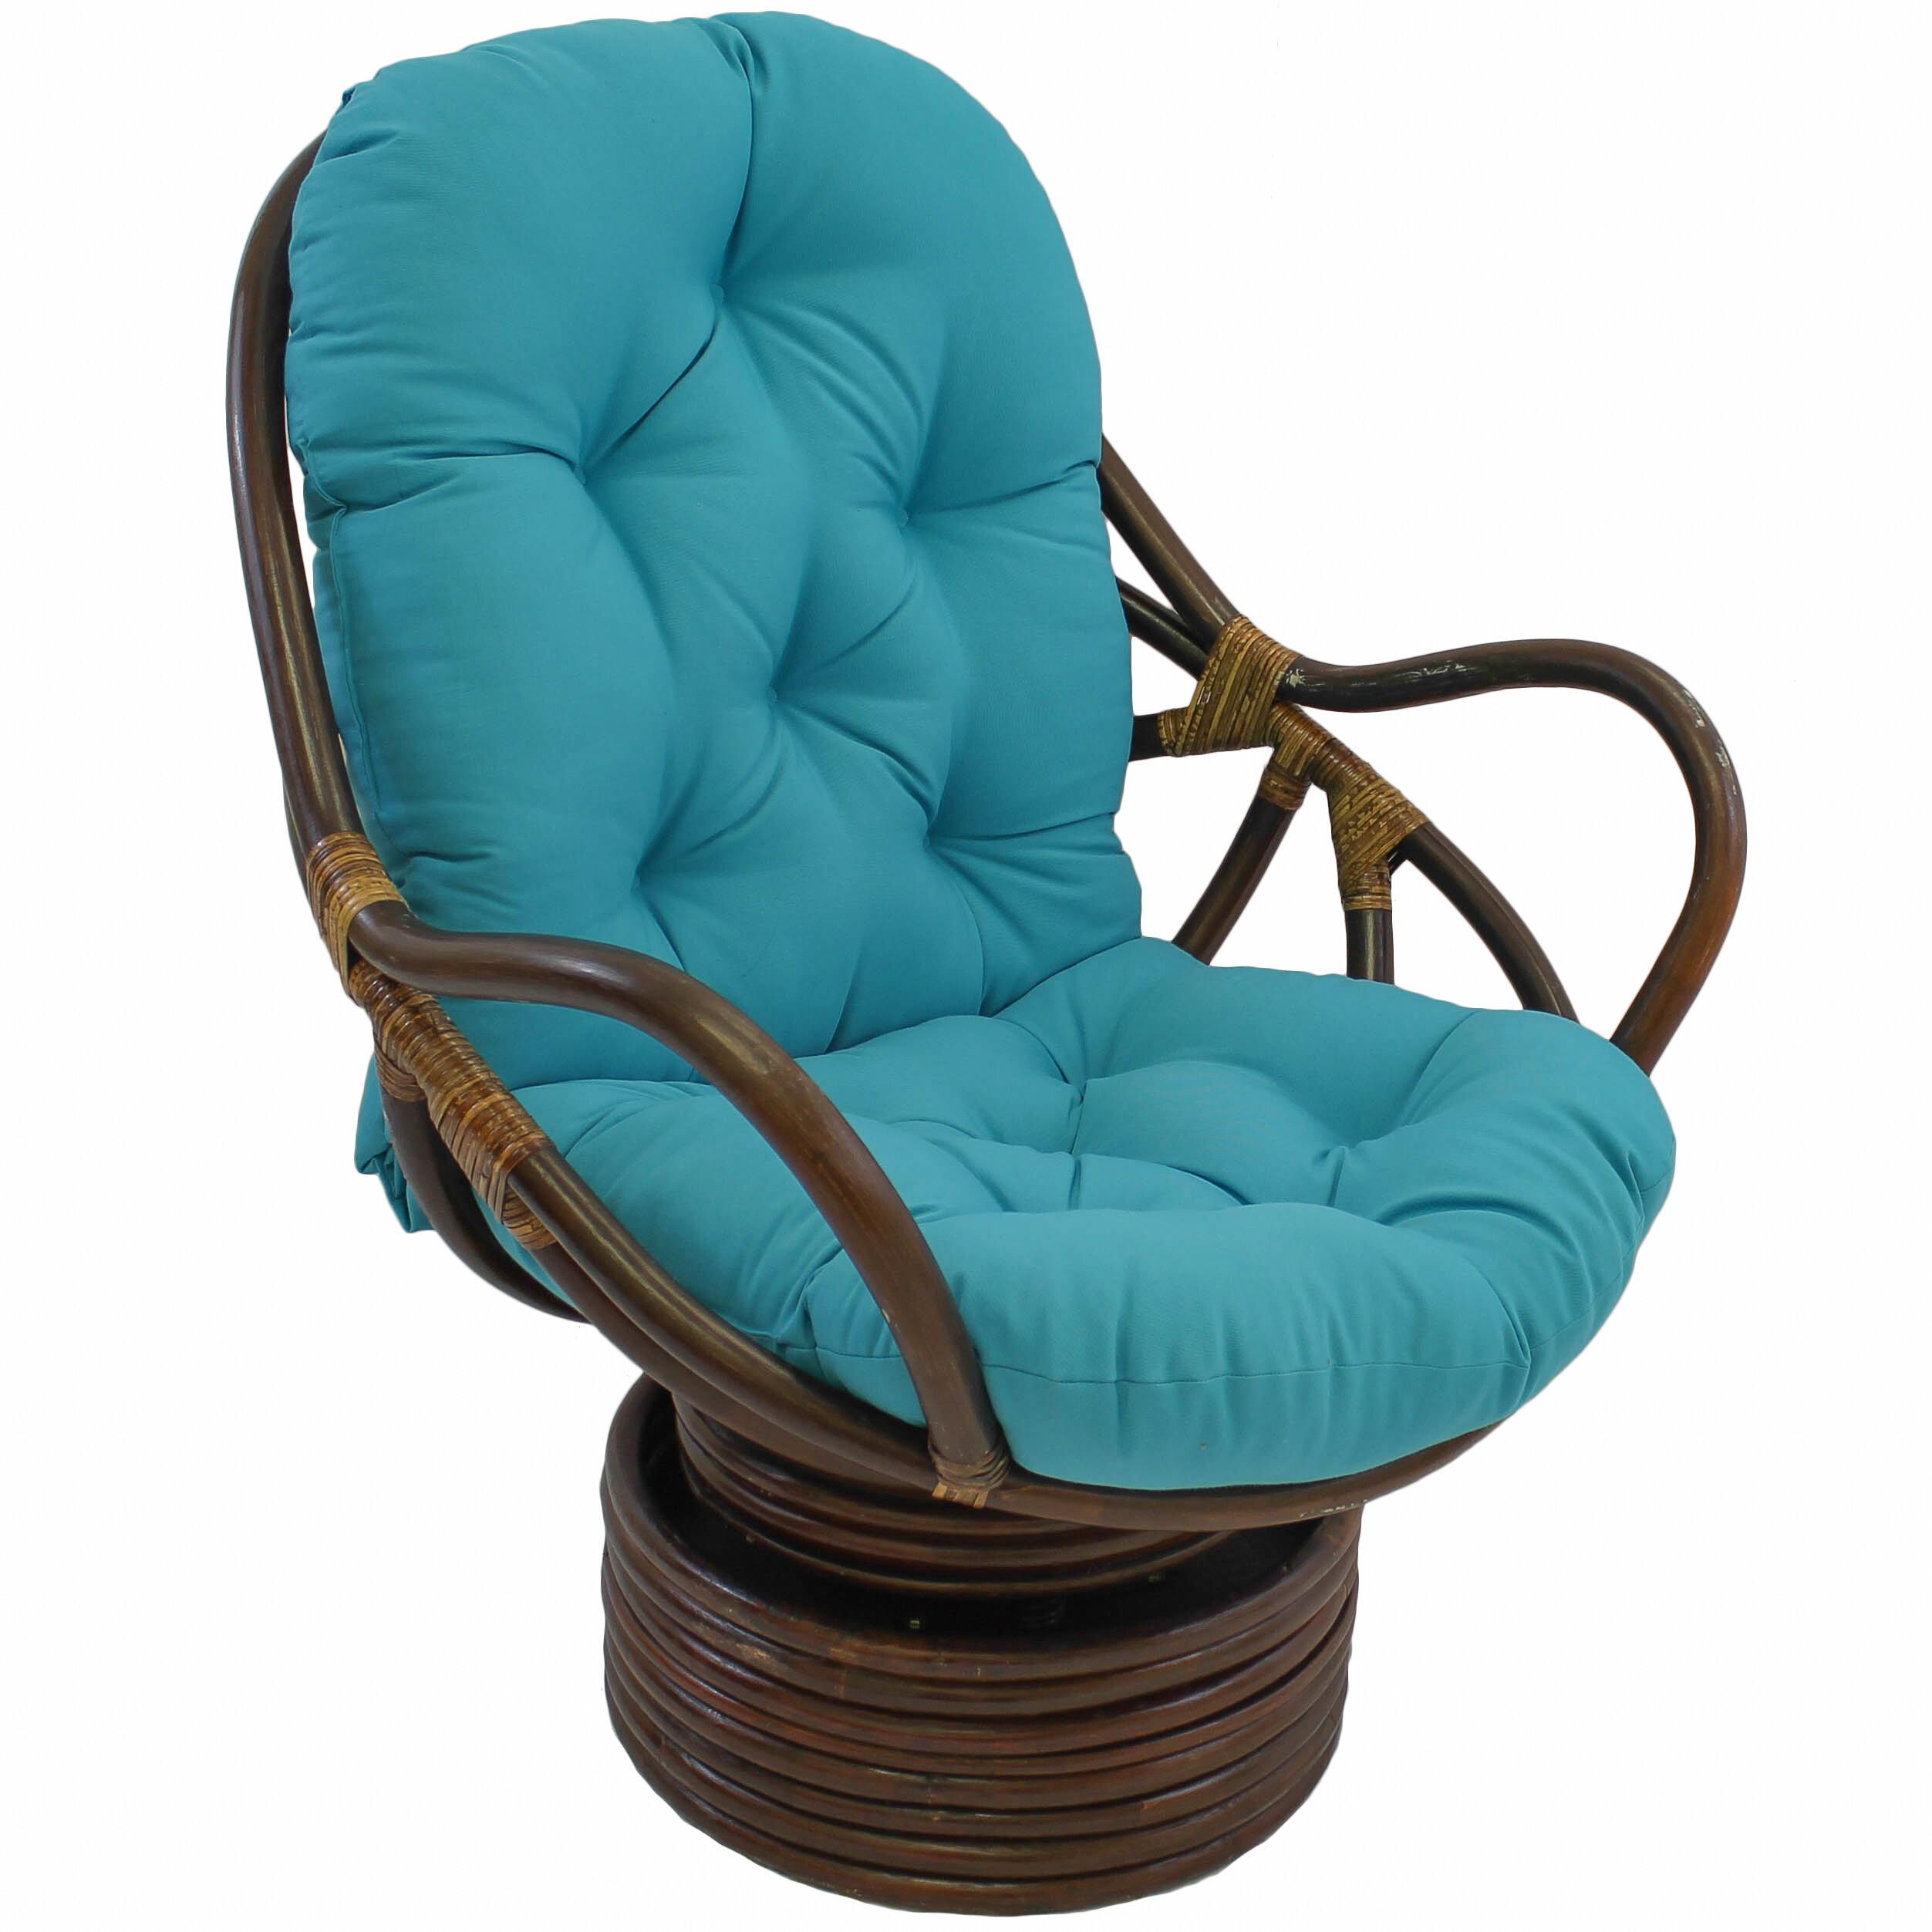 Bungalow Rose Benahid Outdoor Rattan Swivel Chair With Cushion U0026 Reviews |  Wayfair